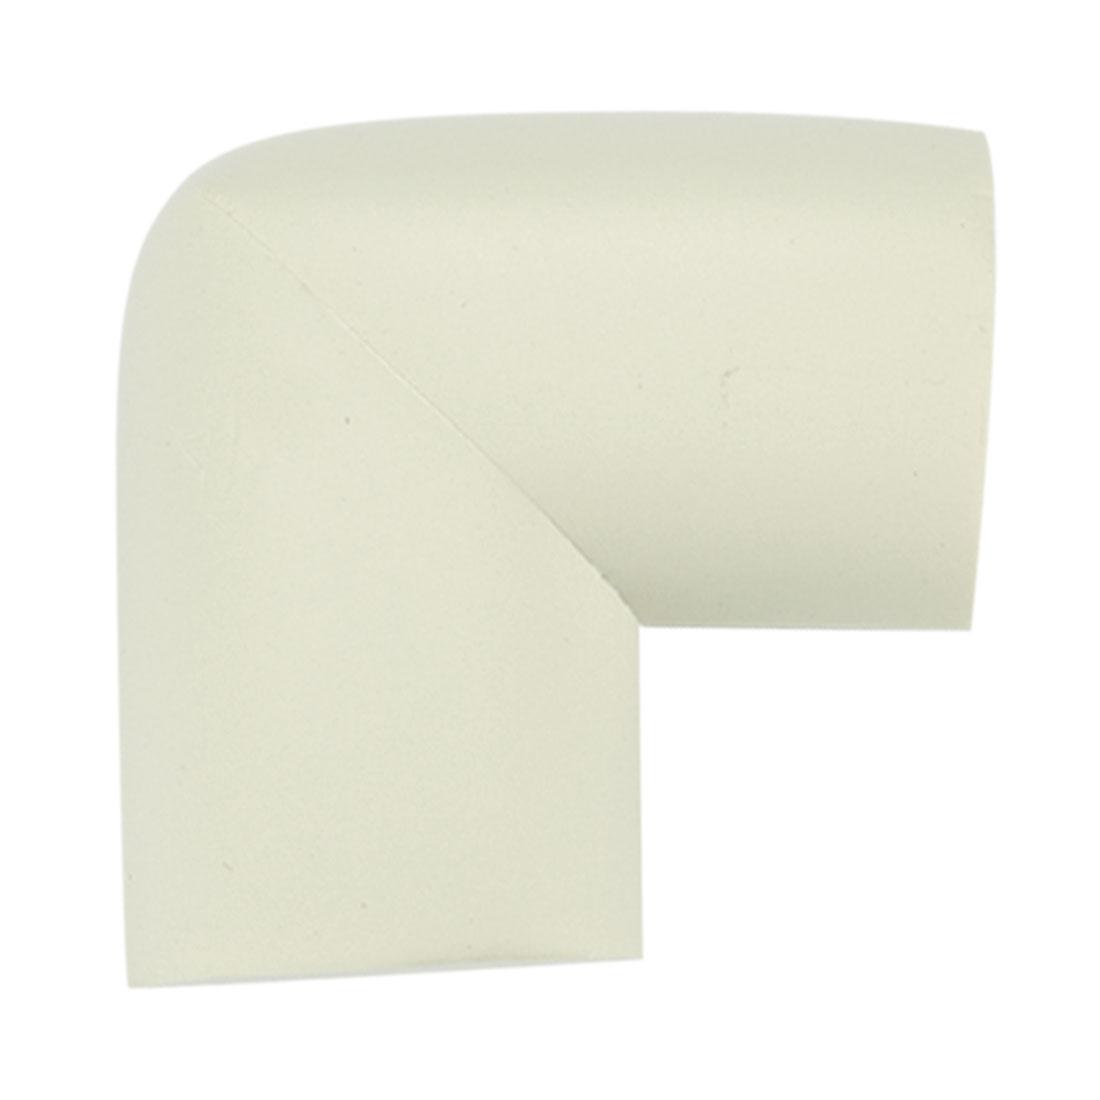 Edge Foam Corner Cushions Guards Strip Roll Soft Bumper Protectors